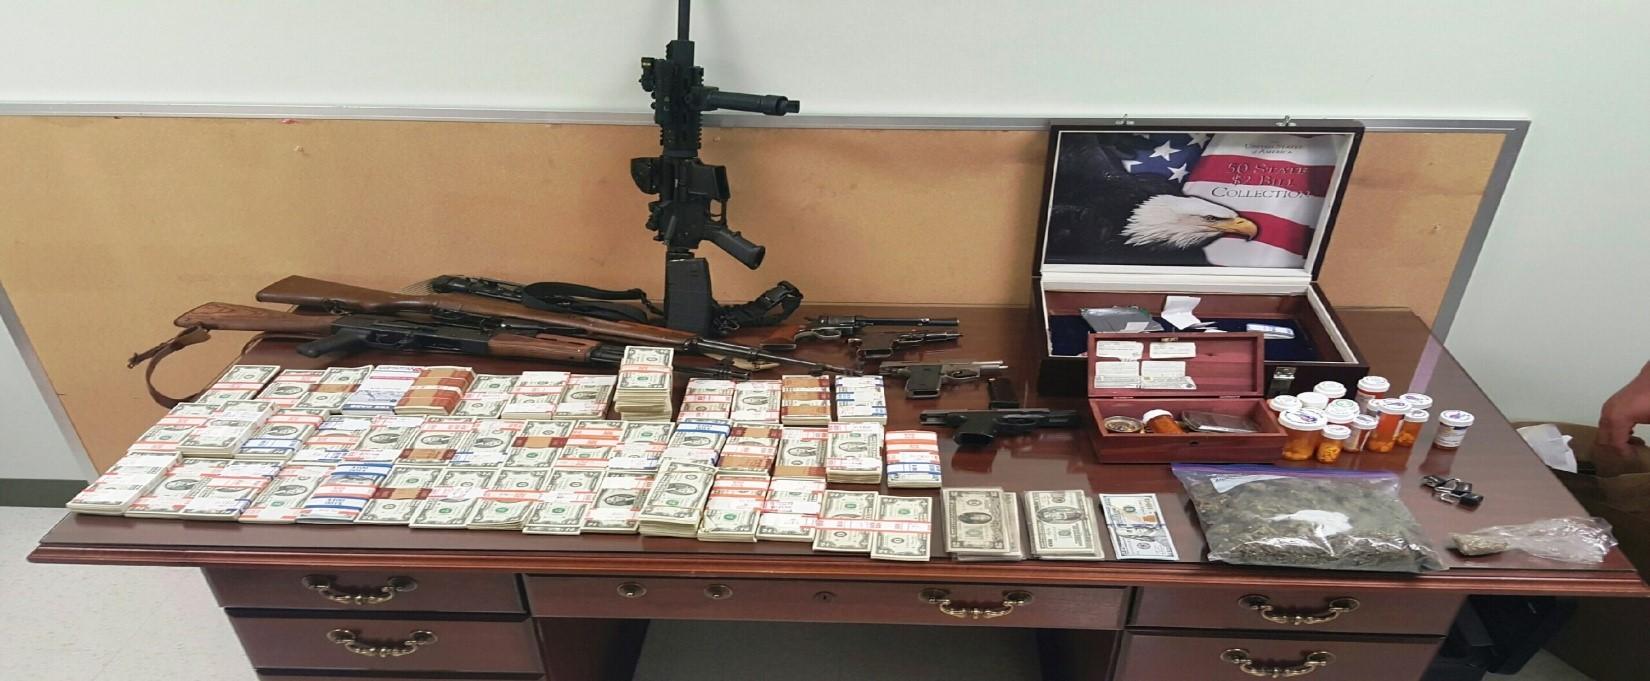 cash and guns st landry bust_195537